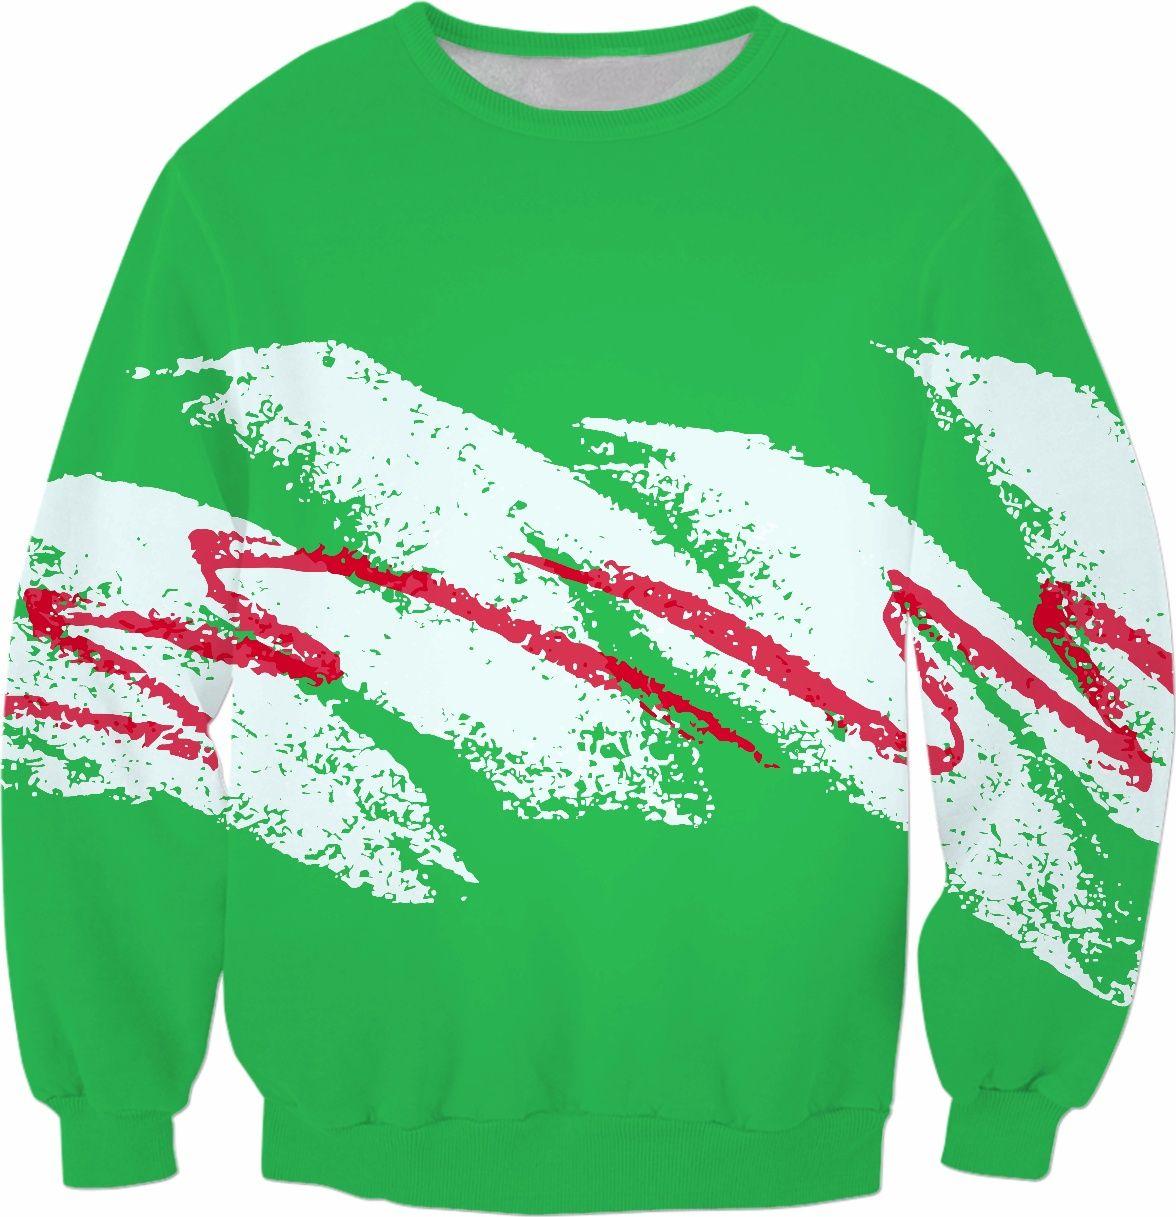 Vaporwave Christmas Sweater.Vaporwave Paper Cup Green Ugly Christmas Sweater Christmas